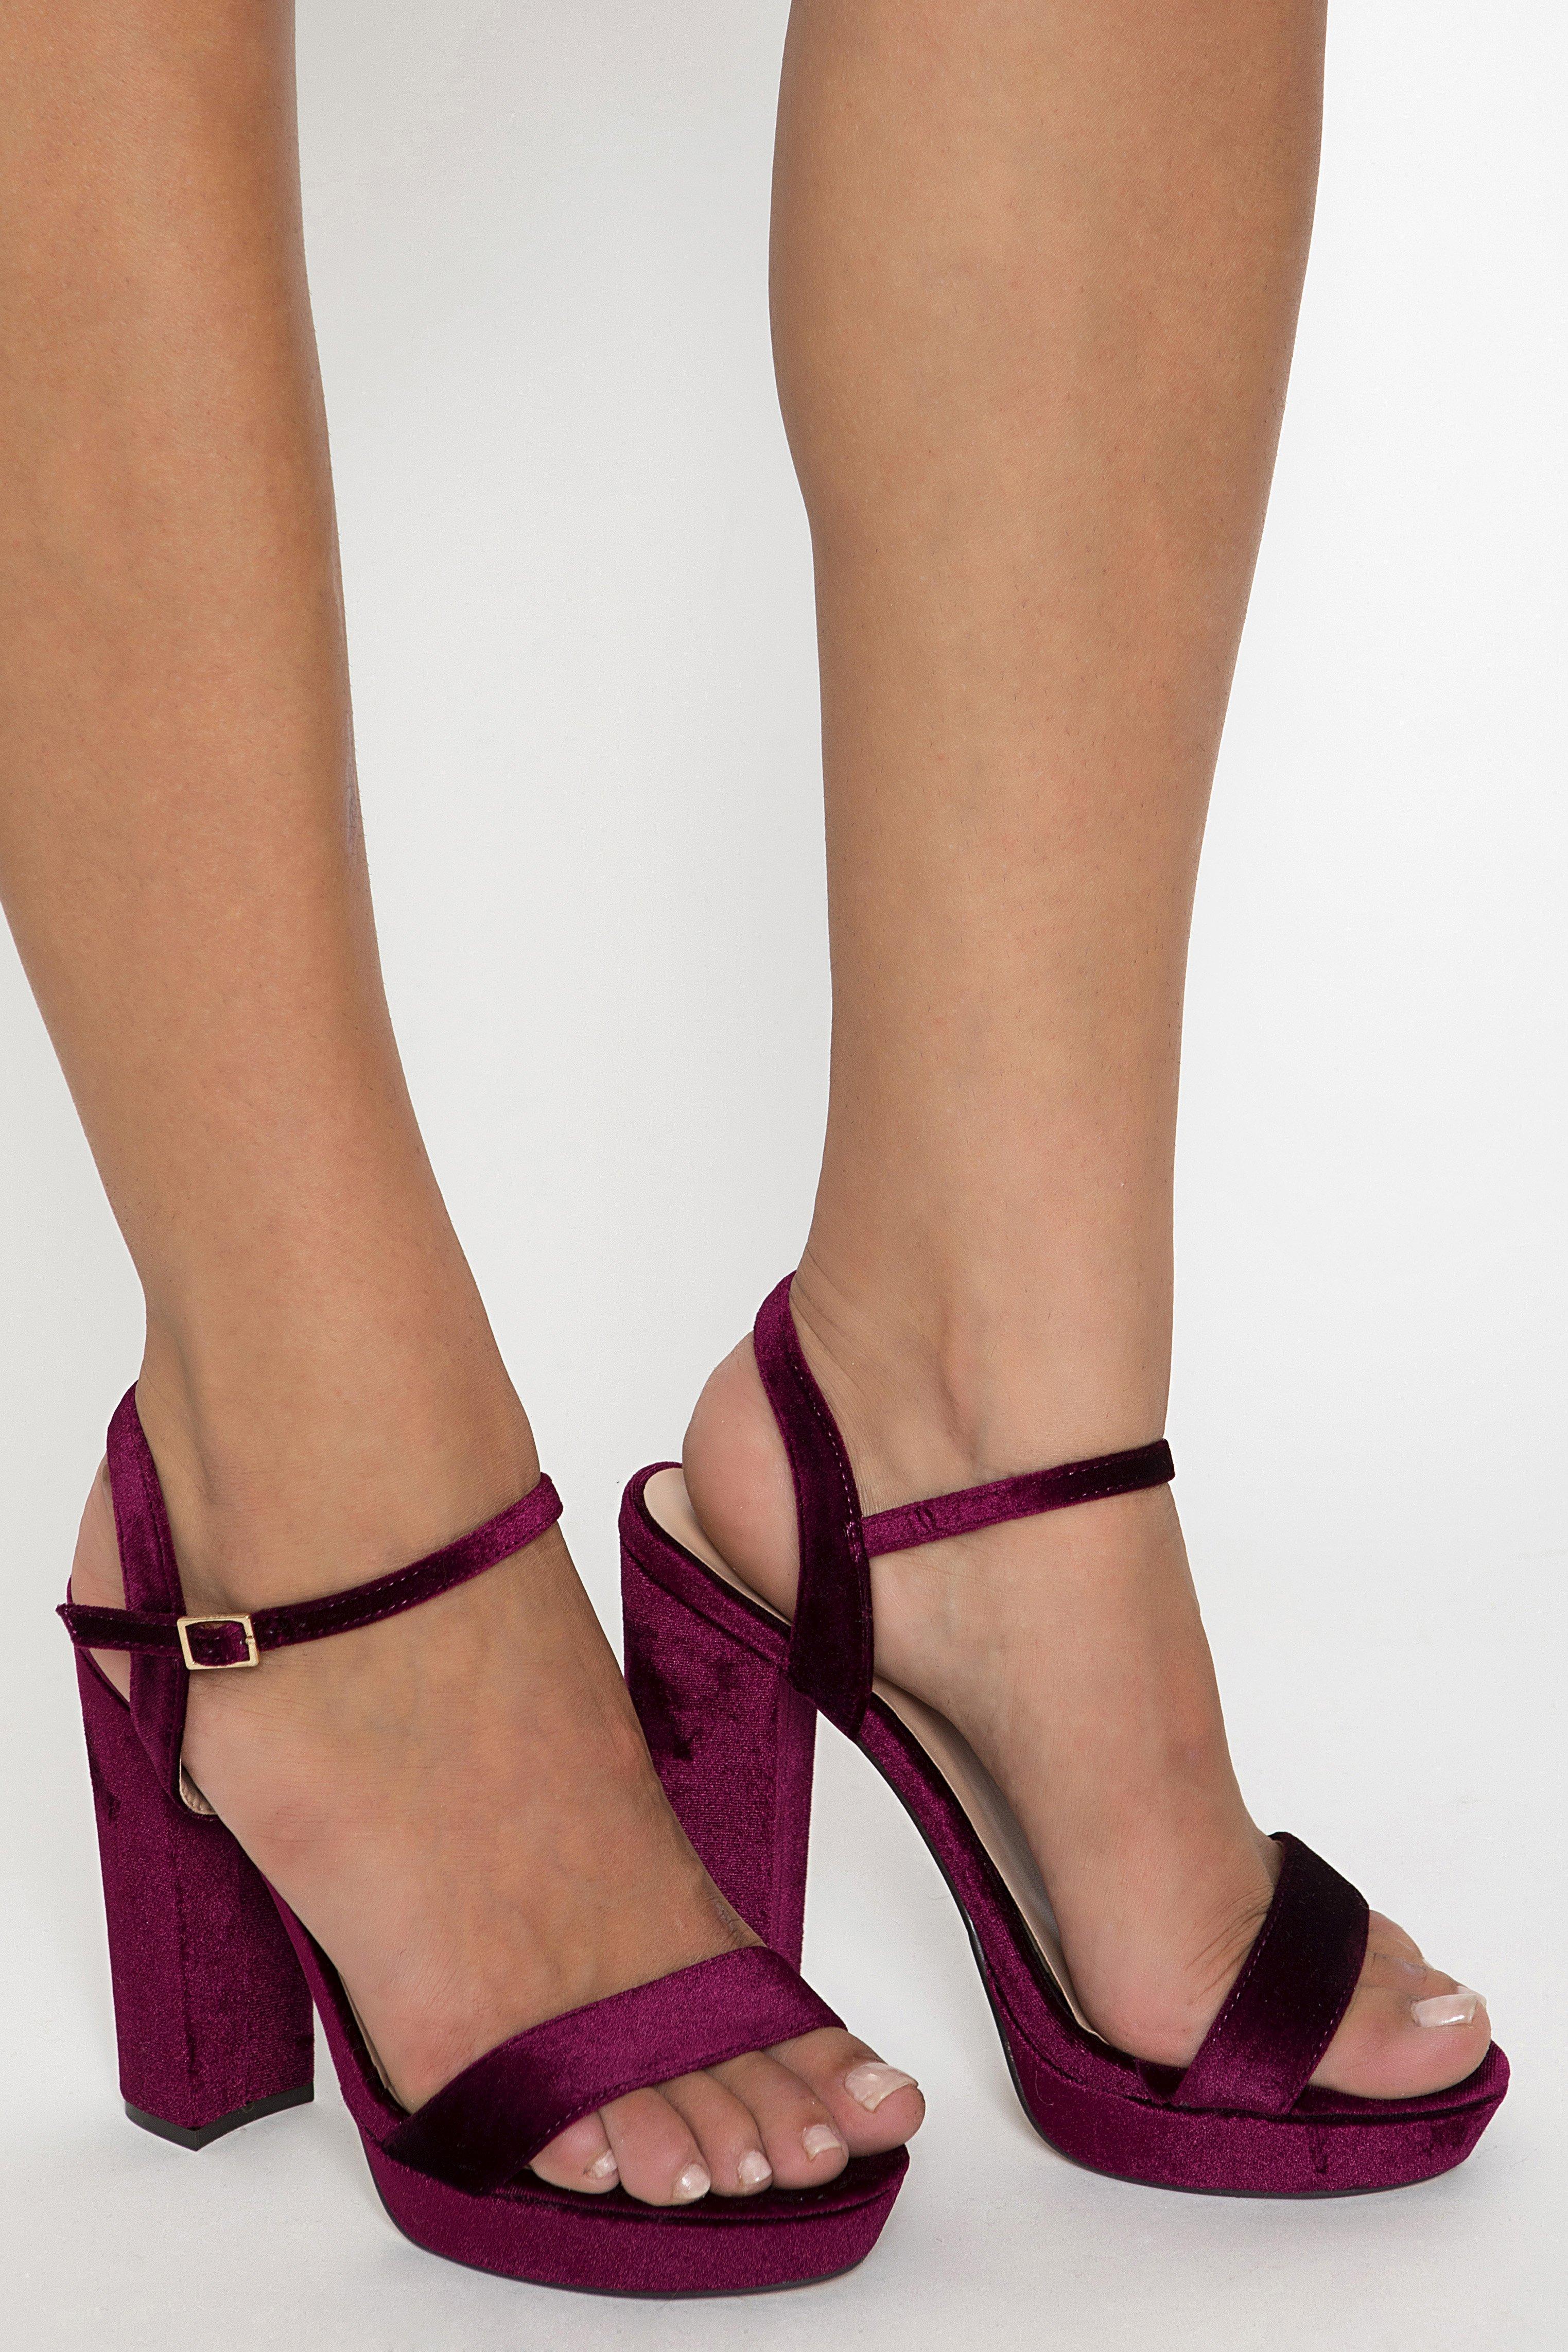 VELVET PLATFORMS - Βυσσινί shoes   heels